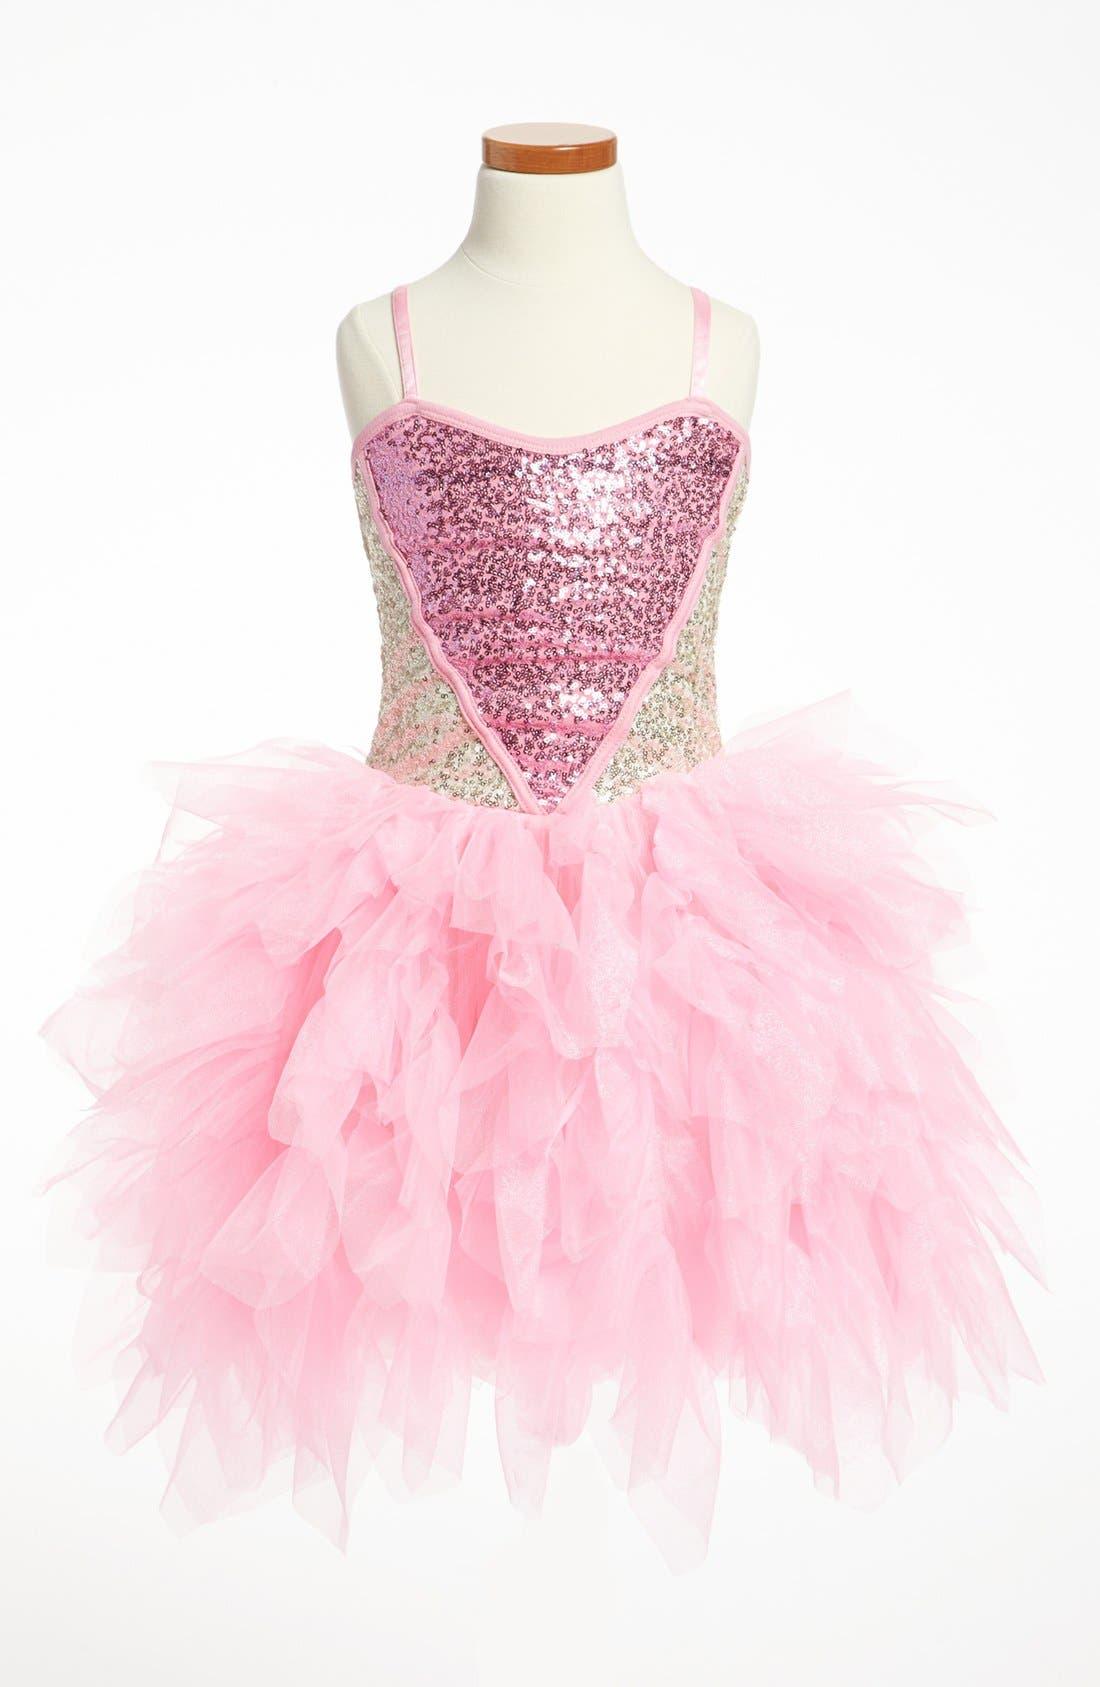 Main Image - Ooh! La, La! Couture 'Sweetheart' Dress (Big Girls)